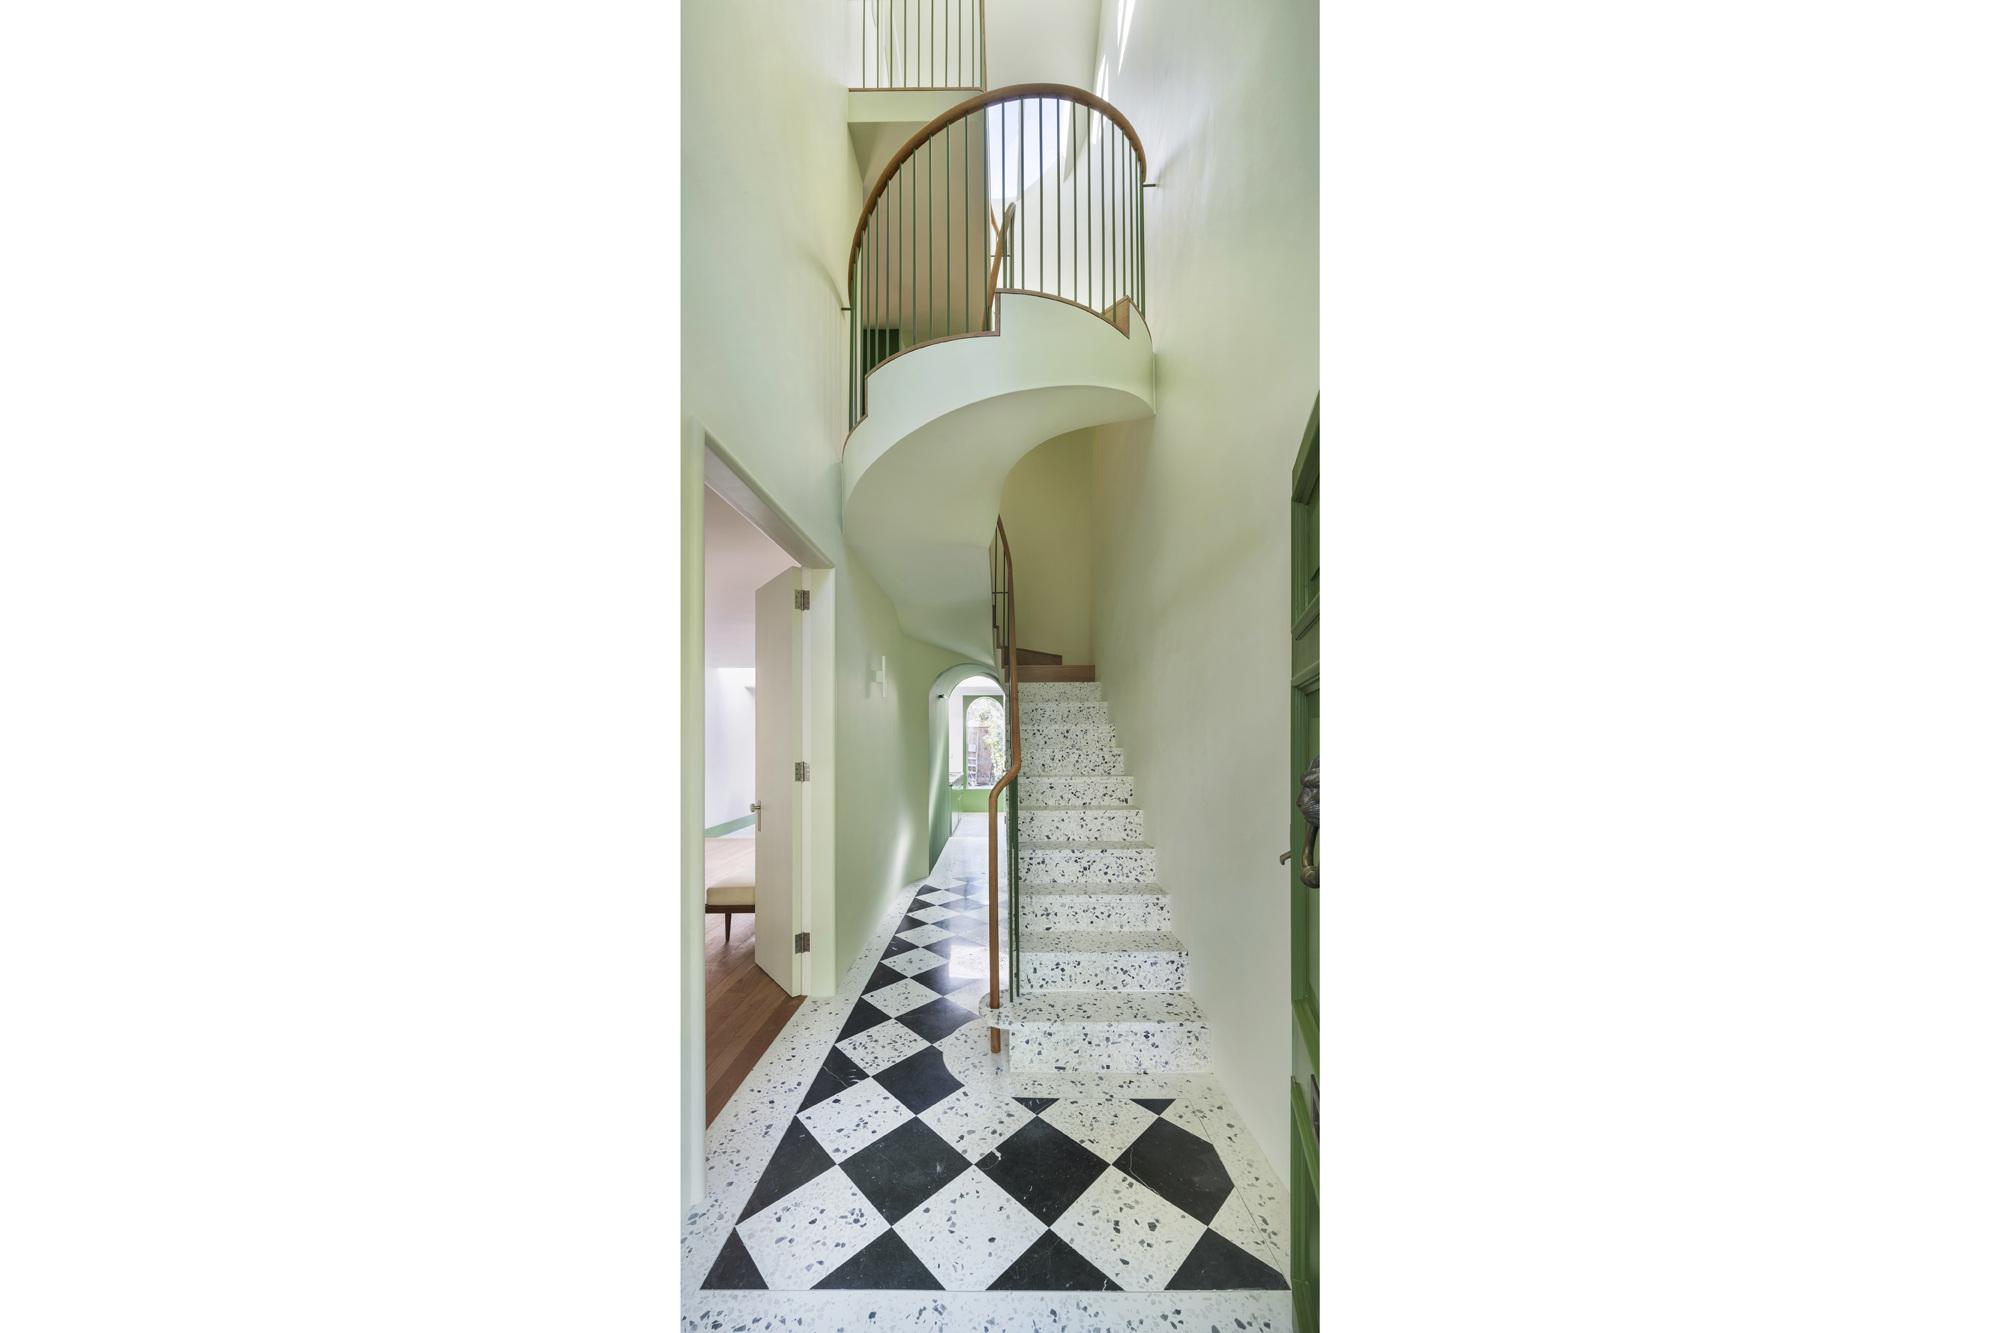 1_White Rabbit House_Gundry+Ducker_Inspirationist